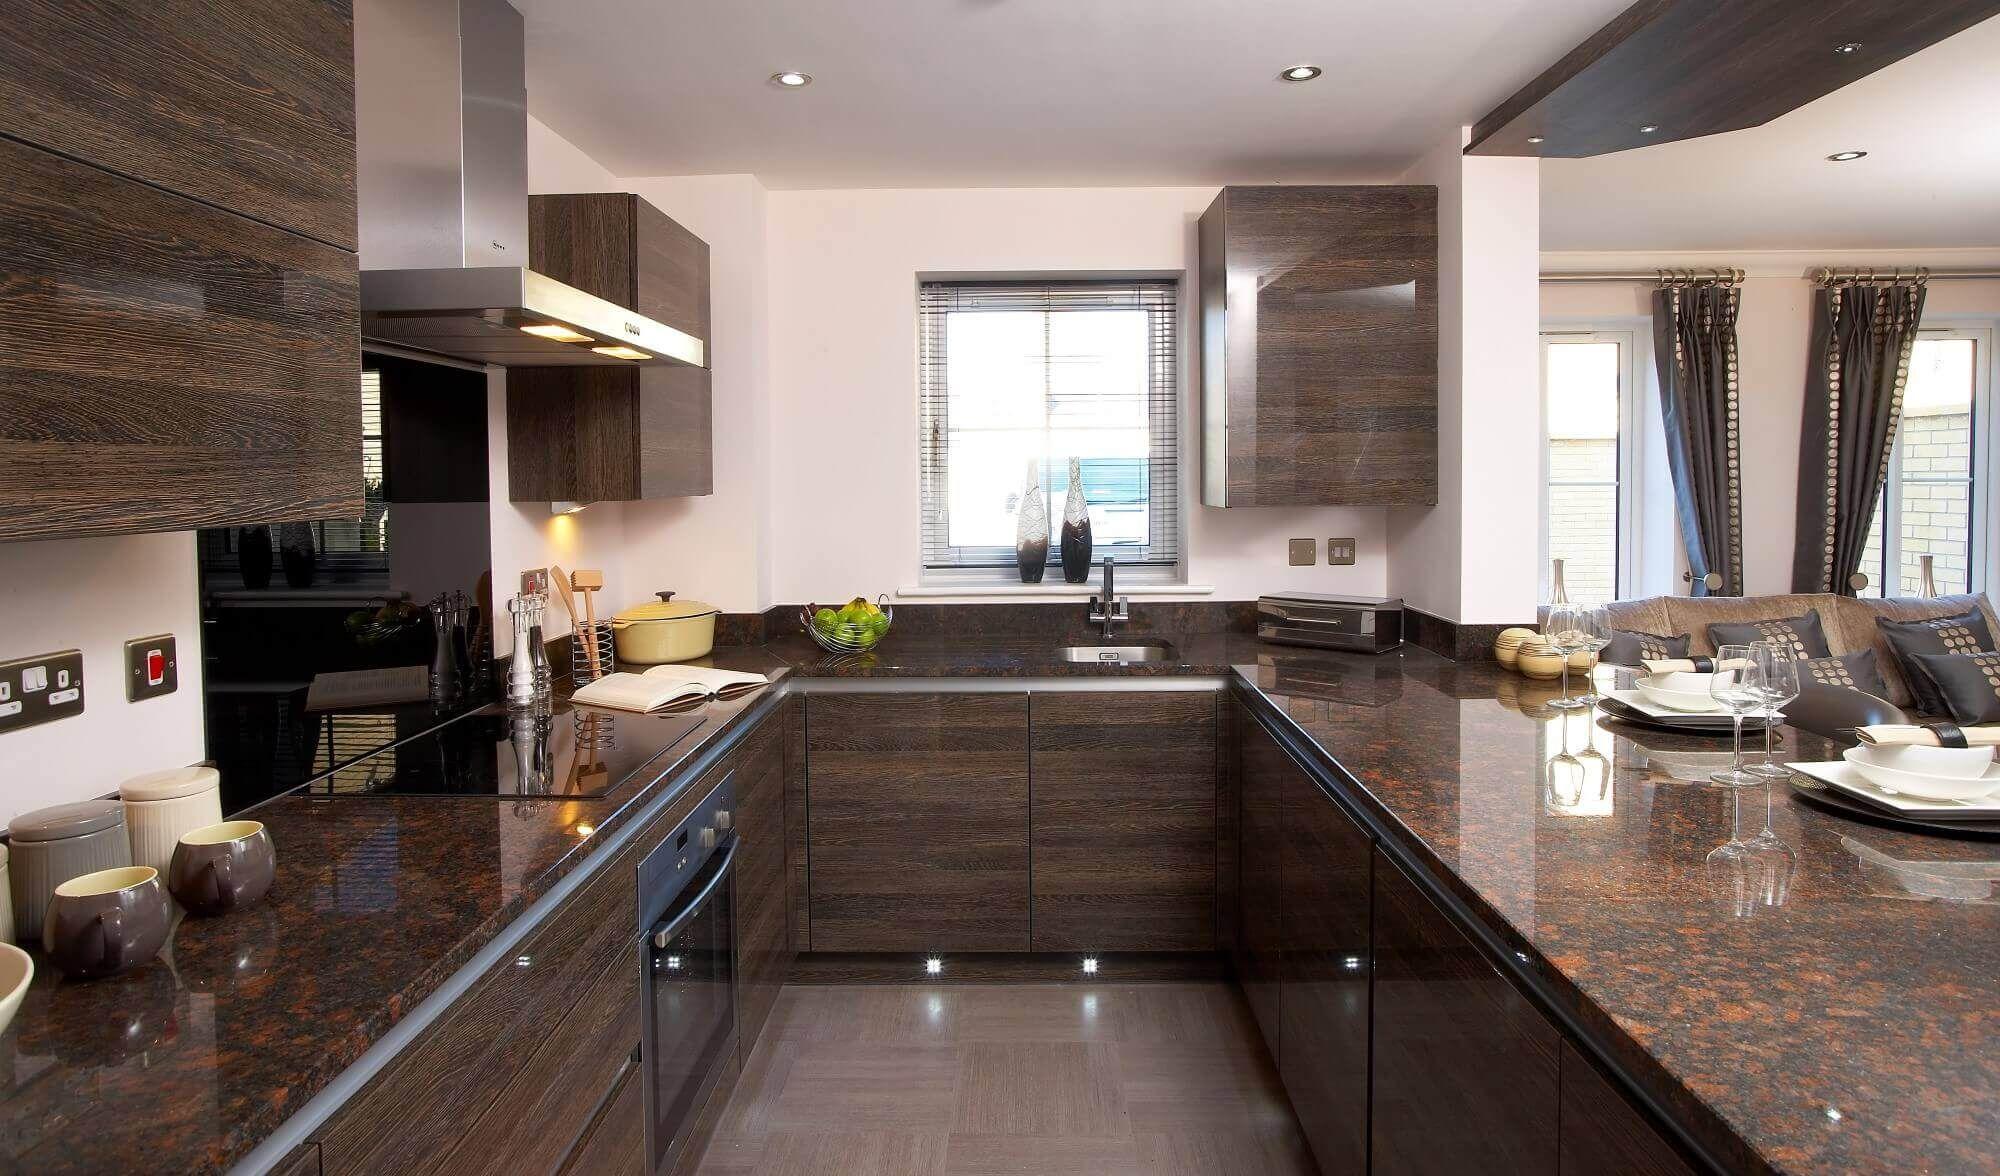 78 Great Looking Modern Kitchen Gallery Kitchen Design Pictures